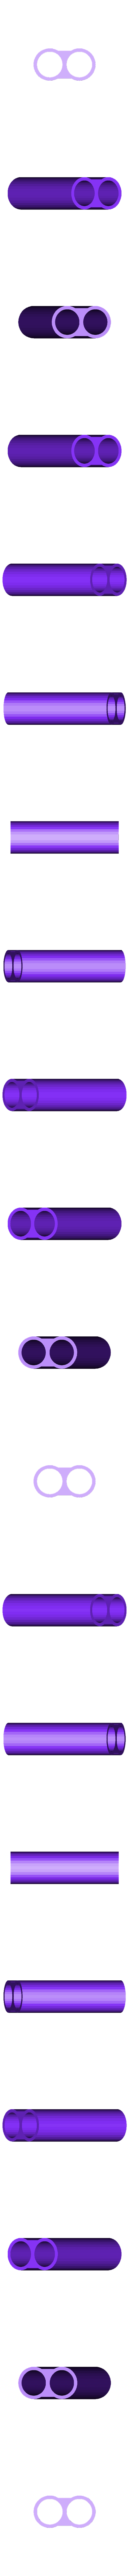 unioncañitasx2.stl Download free STL file Tiny whoop straw gate • 3D printer template, jarp1977